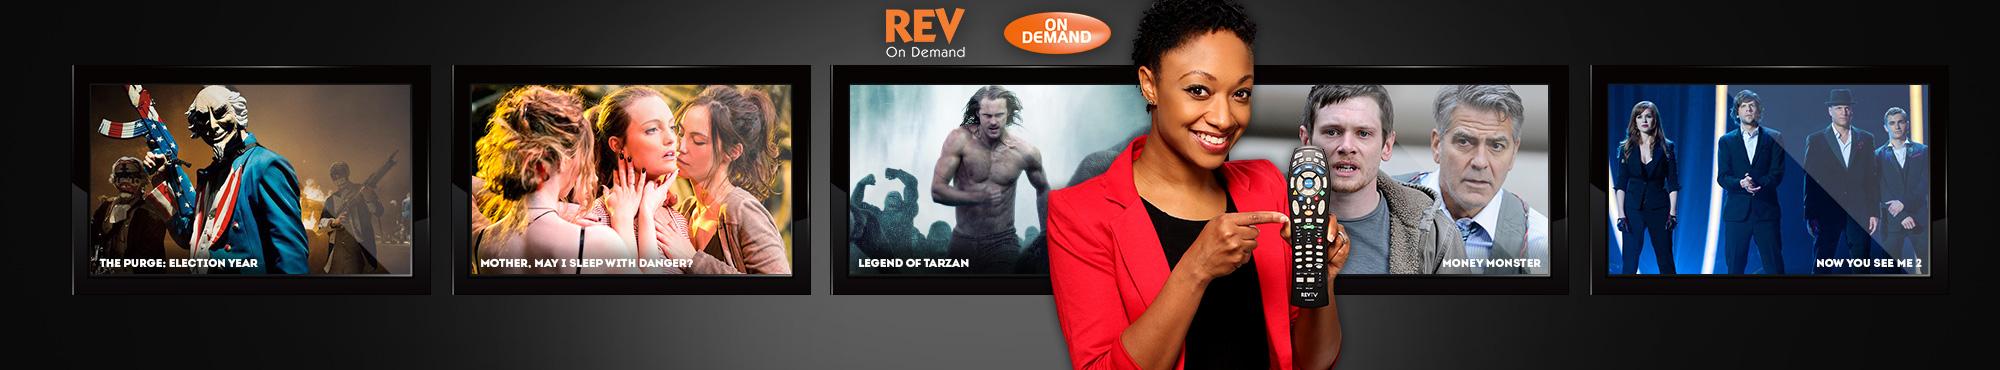 REVTV-VOD-Oct-16-Web-Slider